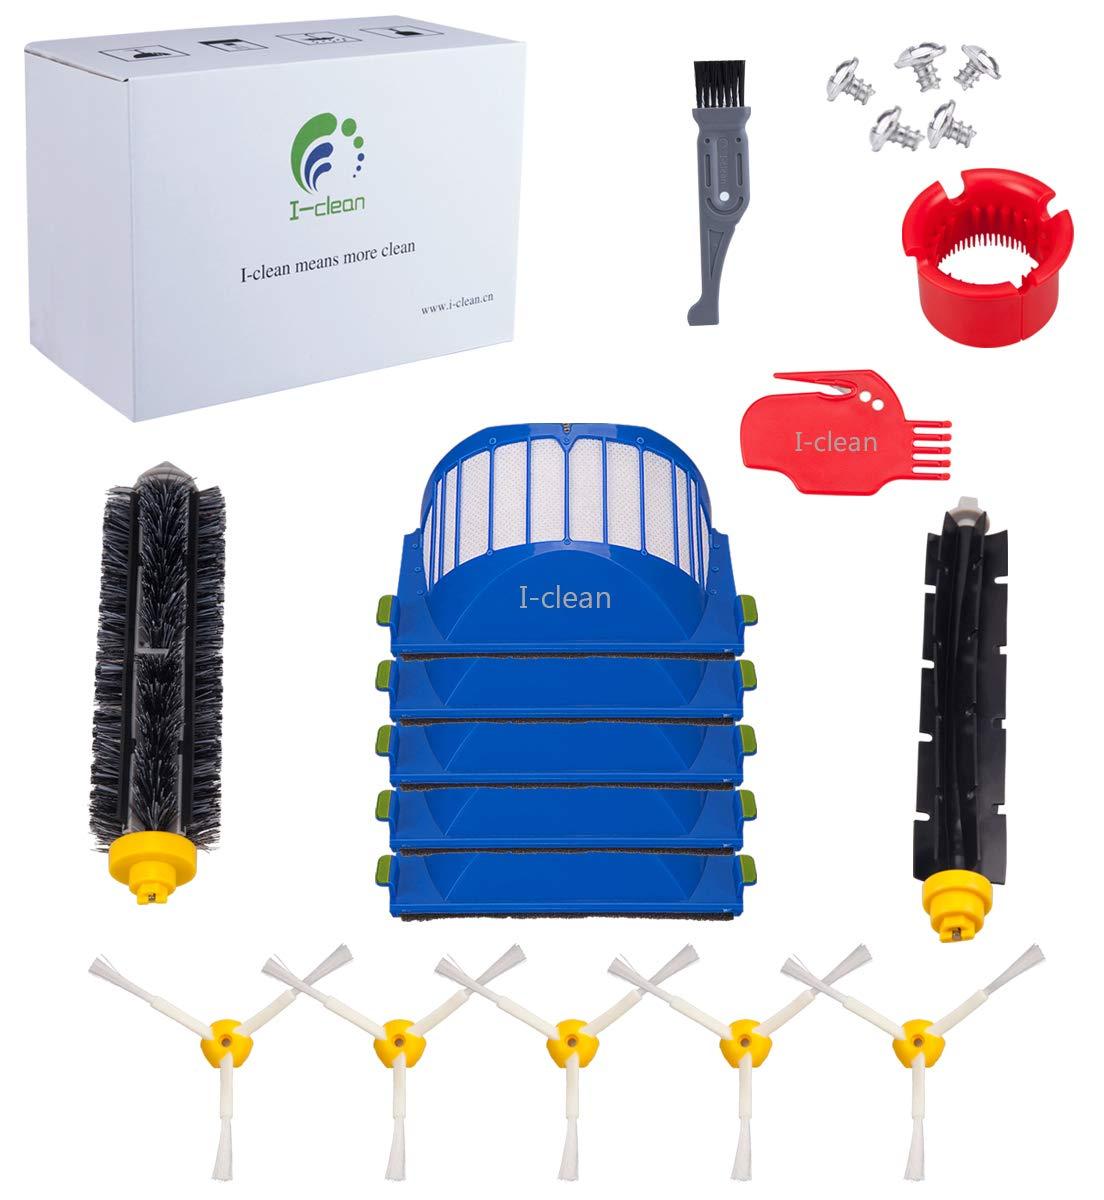 I-clean14pcs Replenishment iRobot Roomba 690 595 614 620 630 650 652 660 680 (600 Series) Parts,Replacement Mega Brushes Kit Bristle & Flexible Beater Brushes& 3-Armed Brushes & Aero Vac Filters